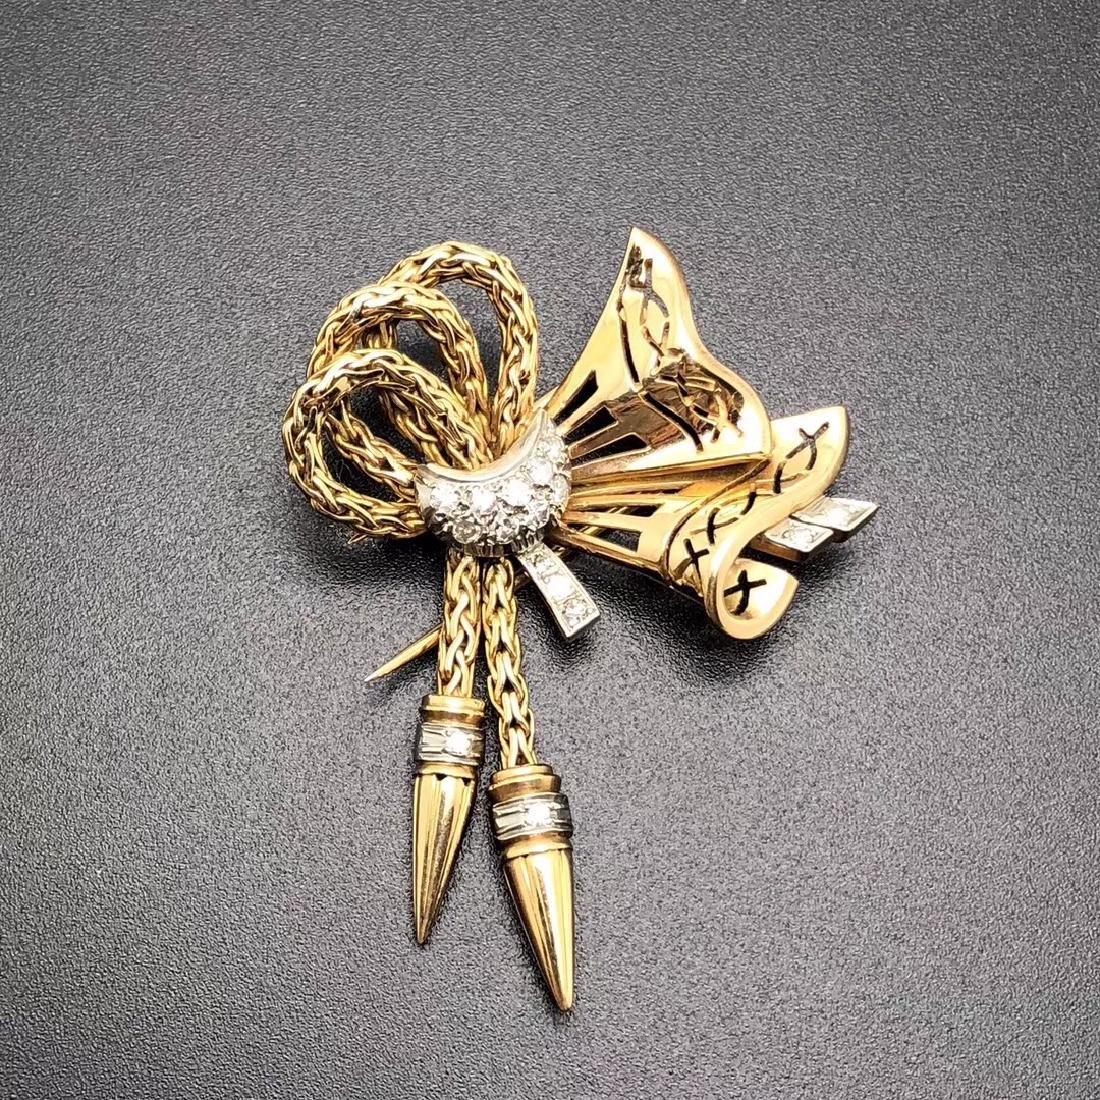 1960S FRENCH 18K GOLD DIAMOND BROOCH